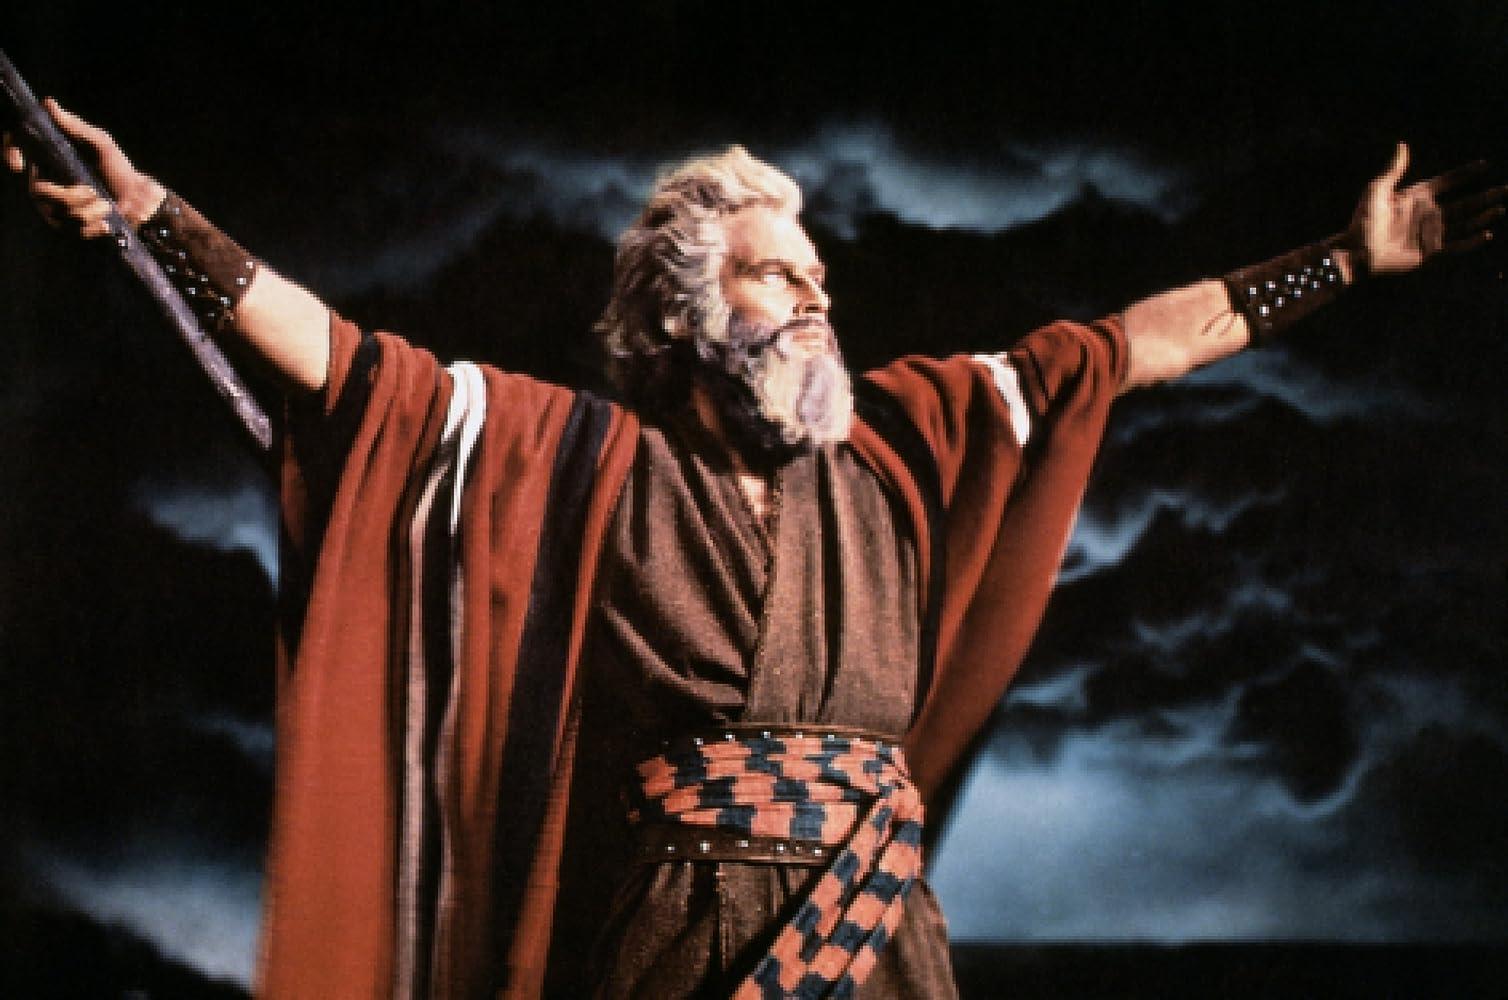 Charlton Heston as Moses in The Ten Commandments